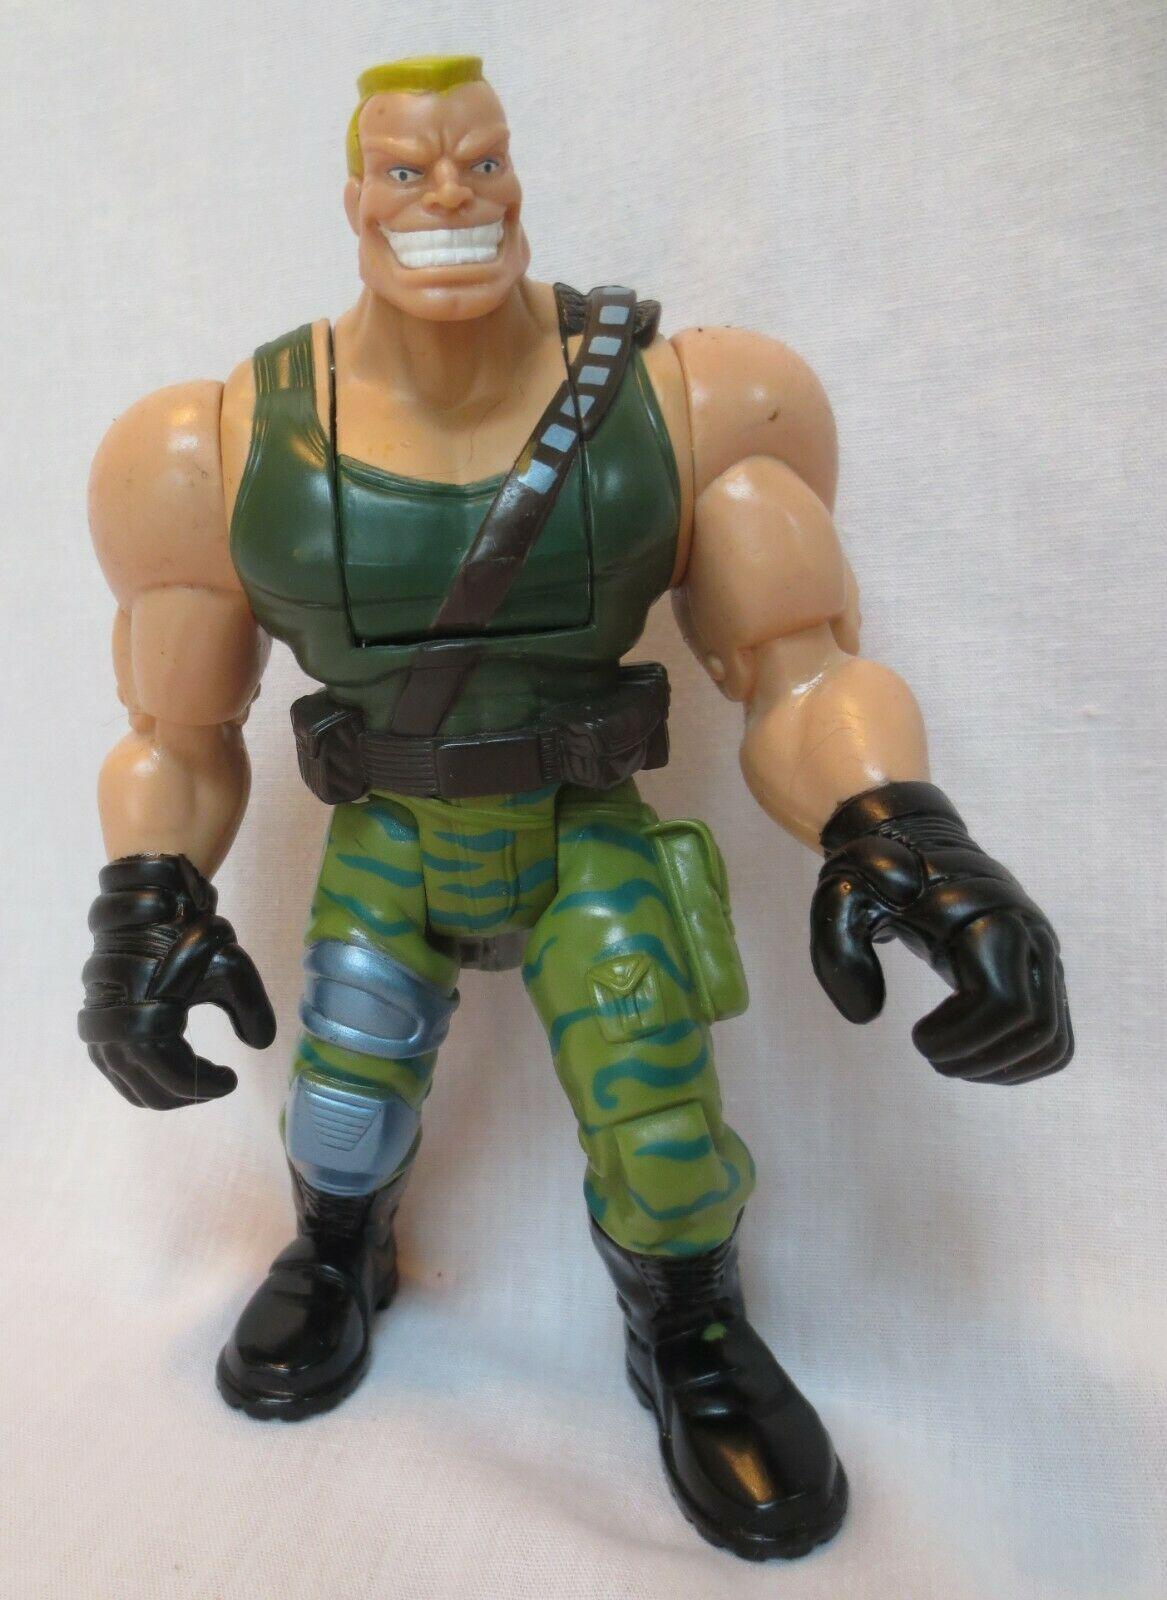 ✰ Hasbro Vintage GI G.I Joe NEW! figure MOC 1993 BATTLE CORPS LEATHERNECK